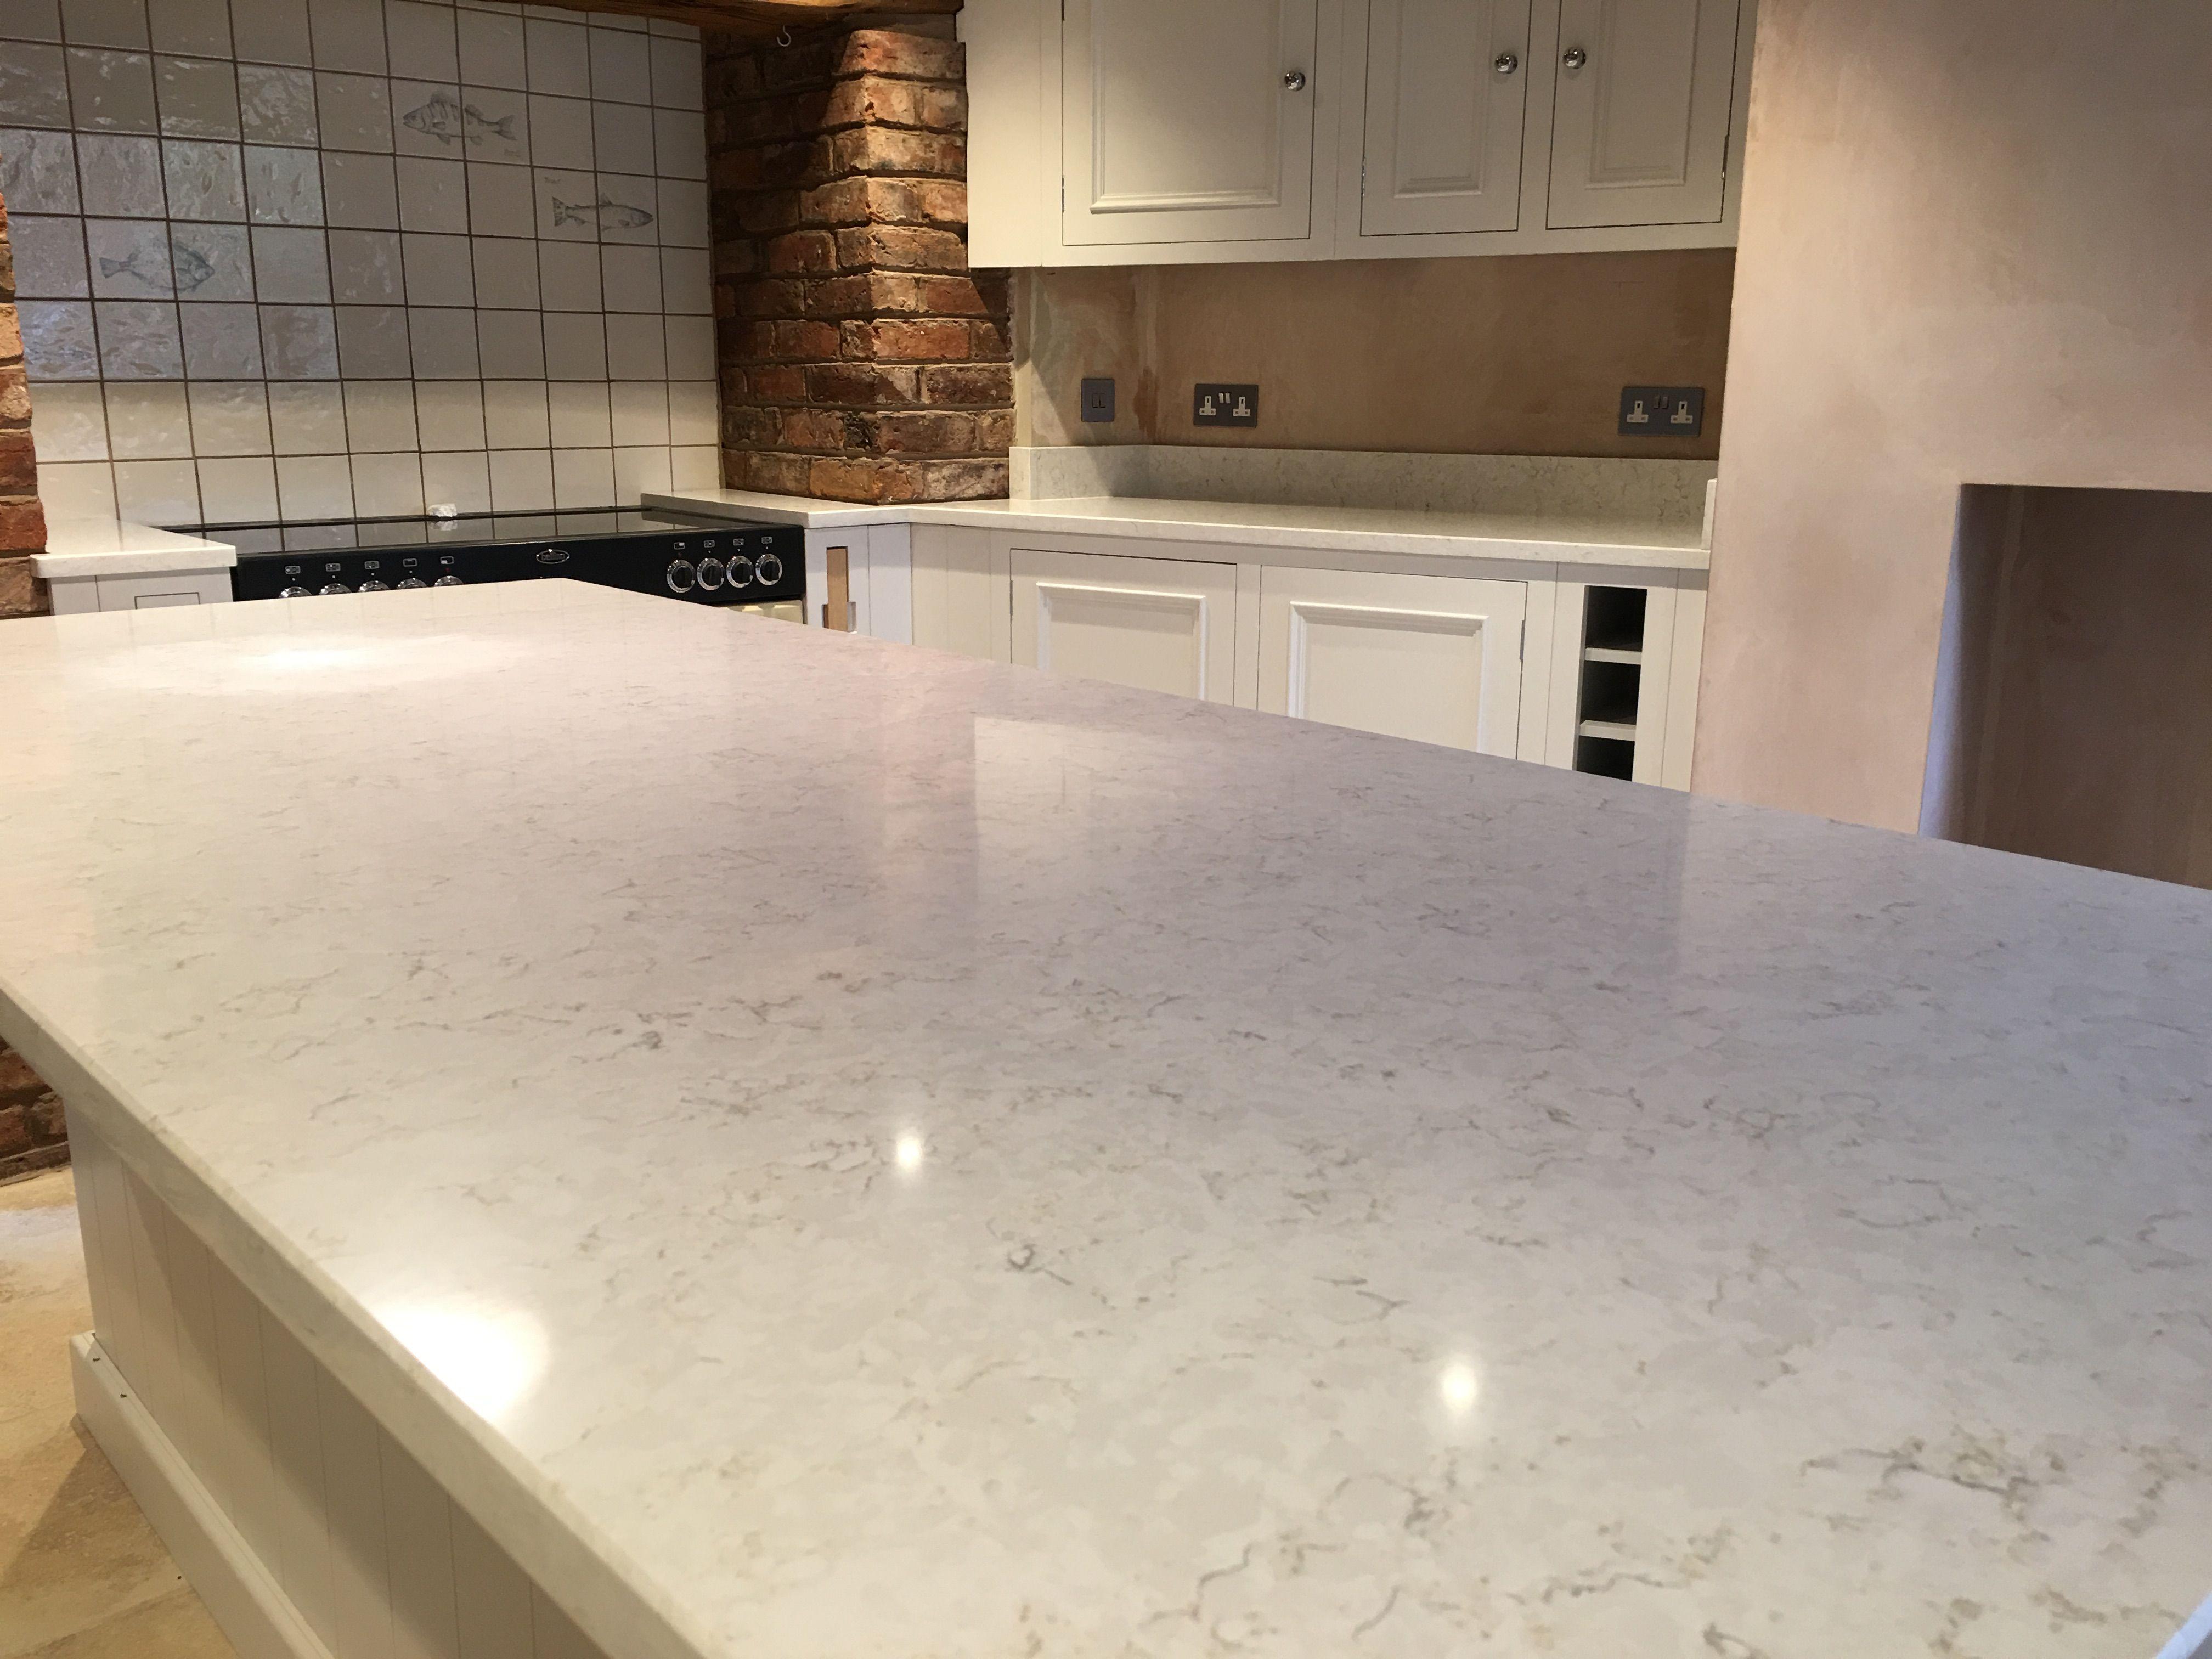 Silestone Lusso Worktops In Chester On A White Kitchen Silestone Countertops Lake House Kitchen White Shaker Kitchen